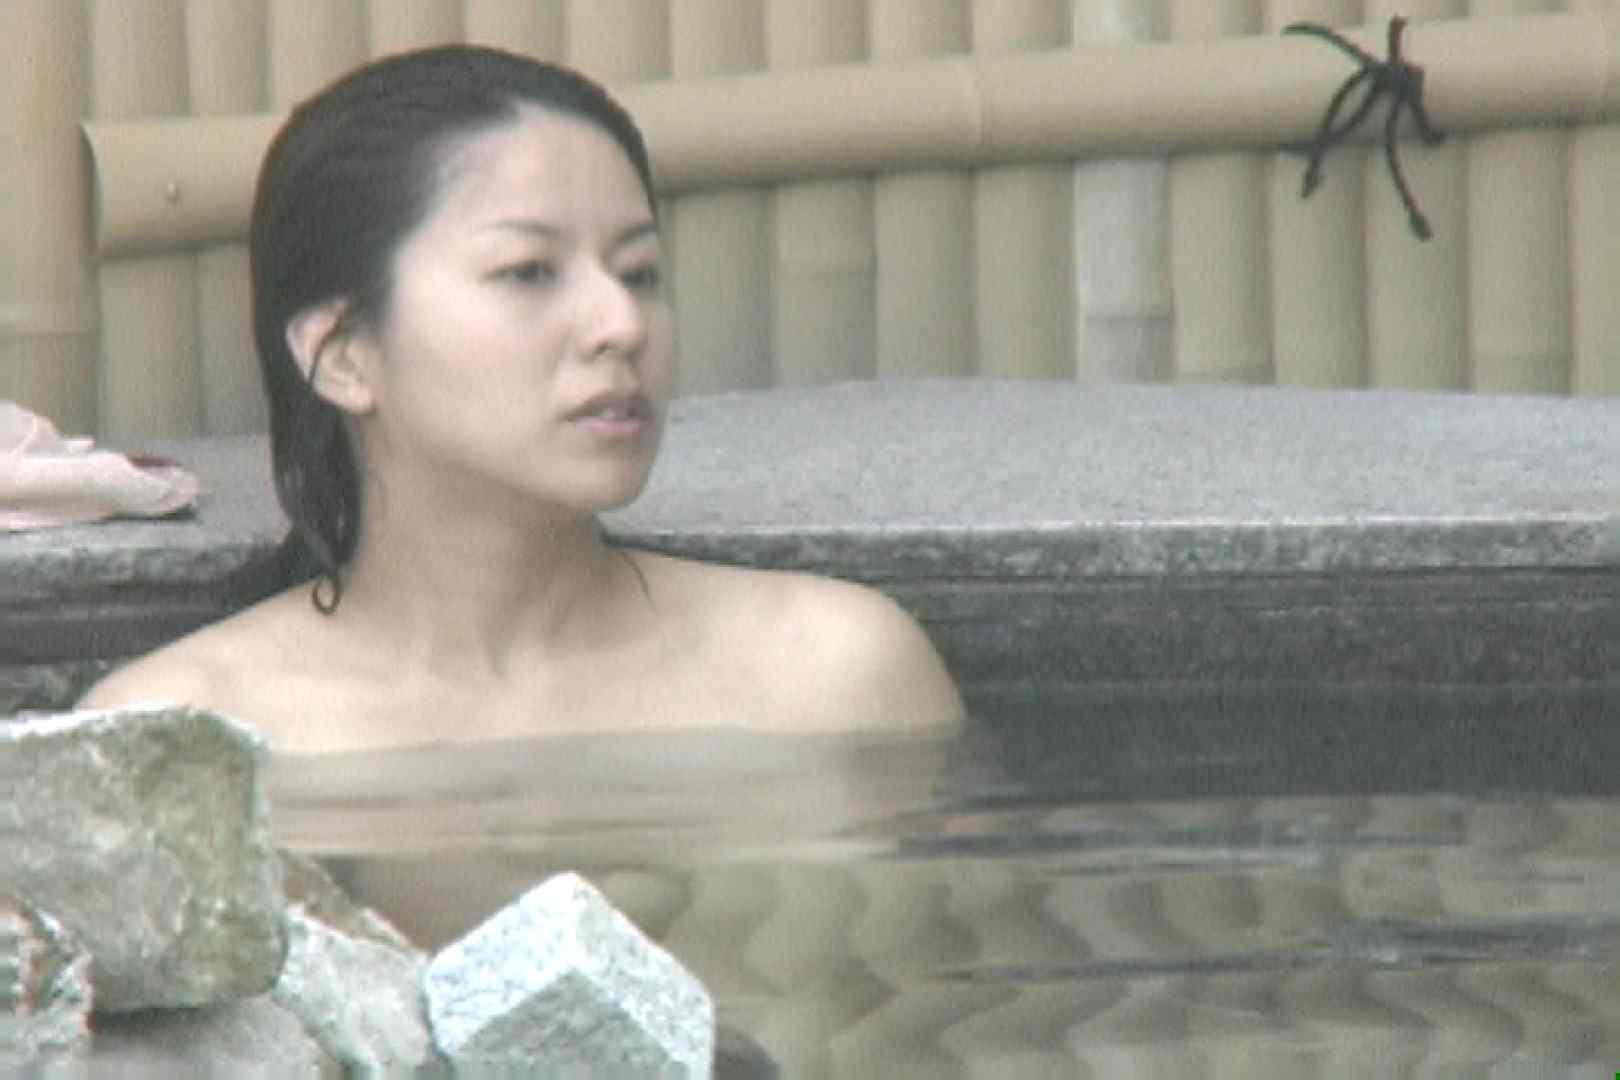 Aquaな露天風呂Vol.694 盗撮 AV無料 67画像 11